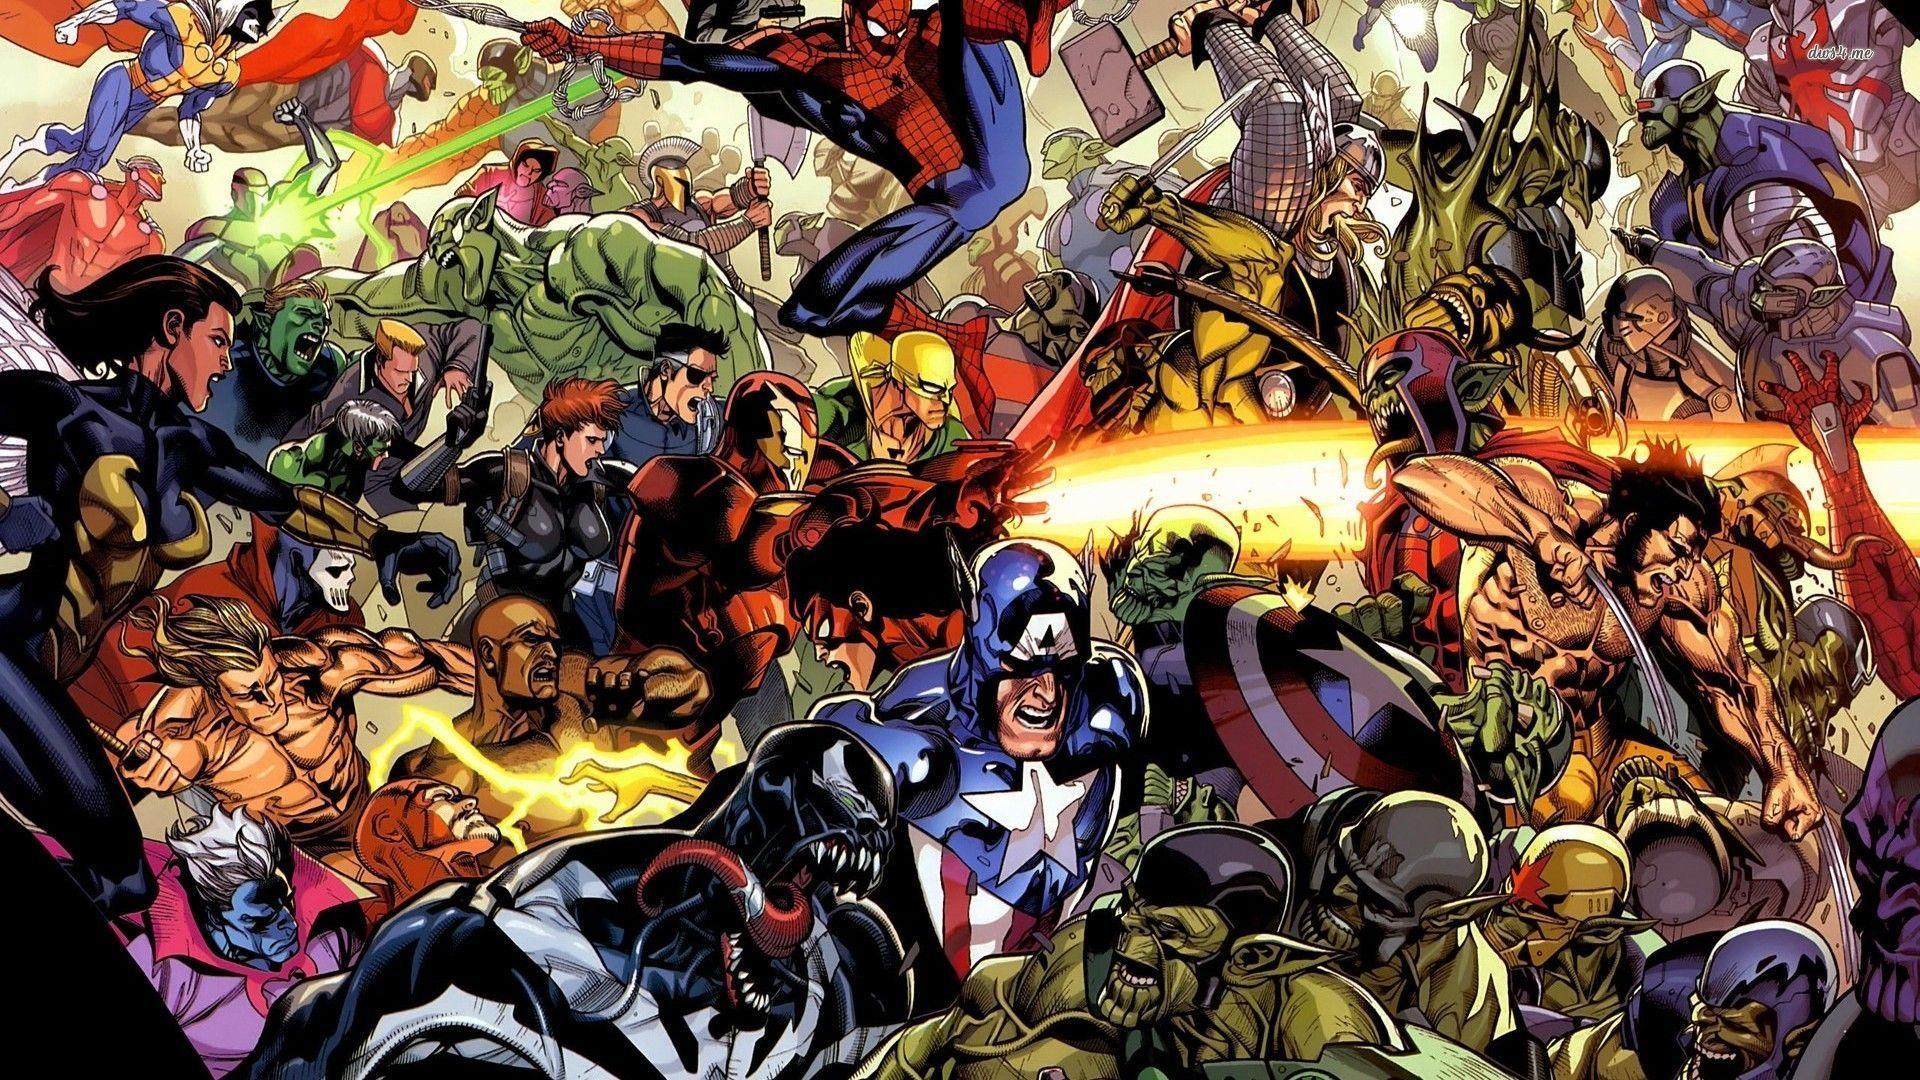 Lego Marvel Super Heroes Wallpapers Hd Wallpaper Cave